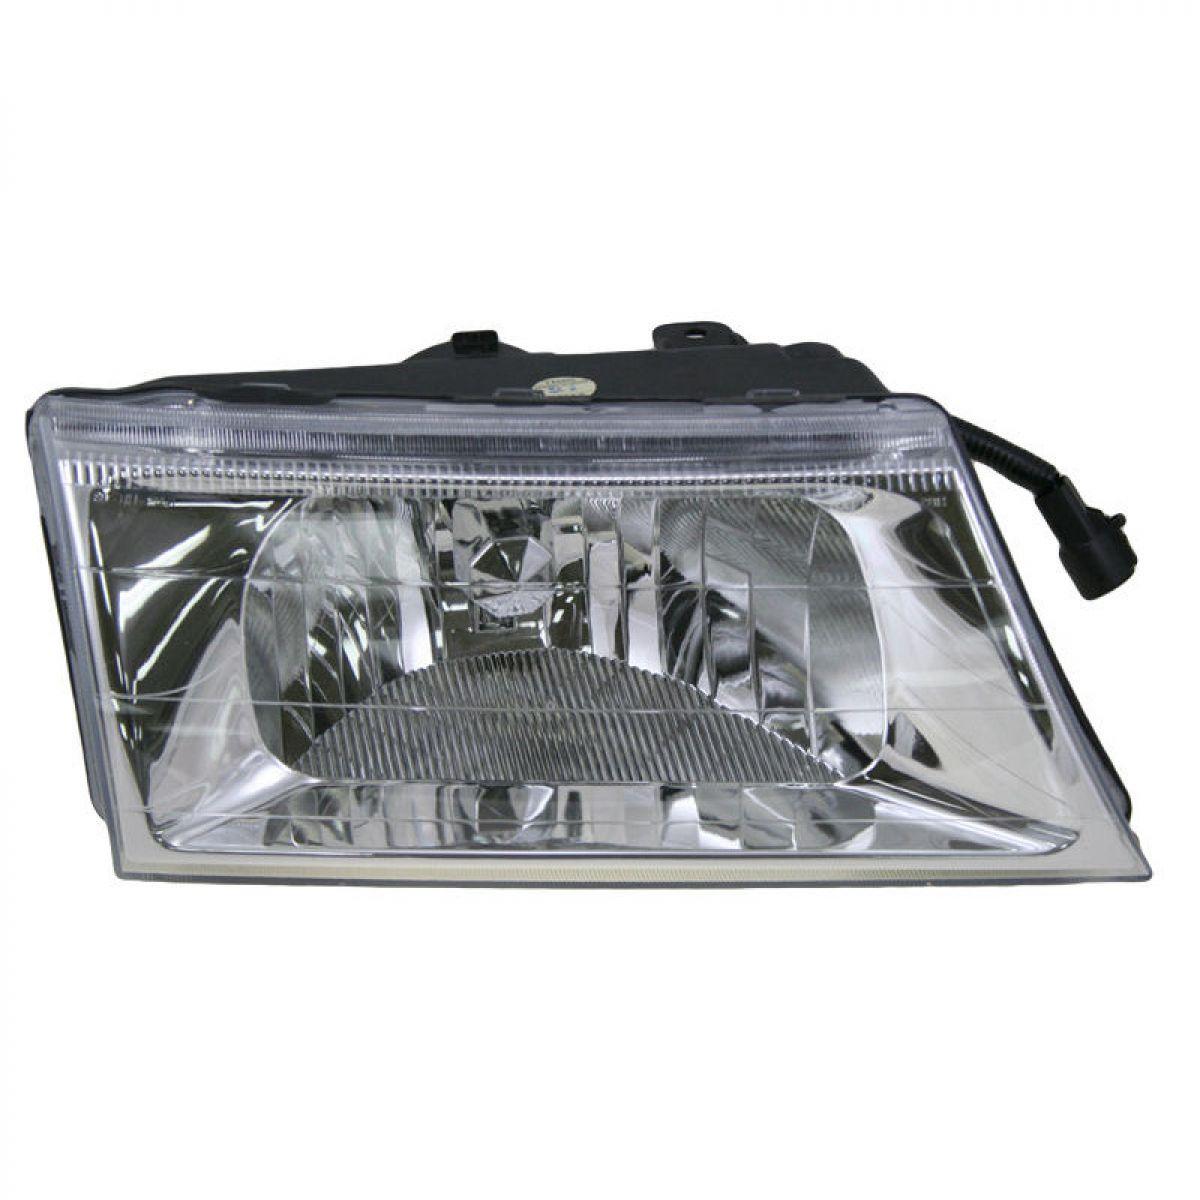 headlight headl passenger side right rh new for 03 04 mercury grand marquis ebay